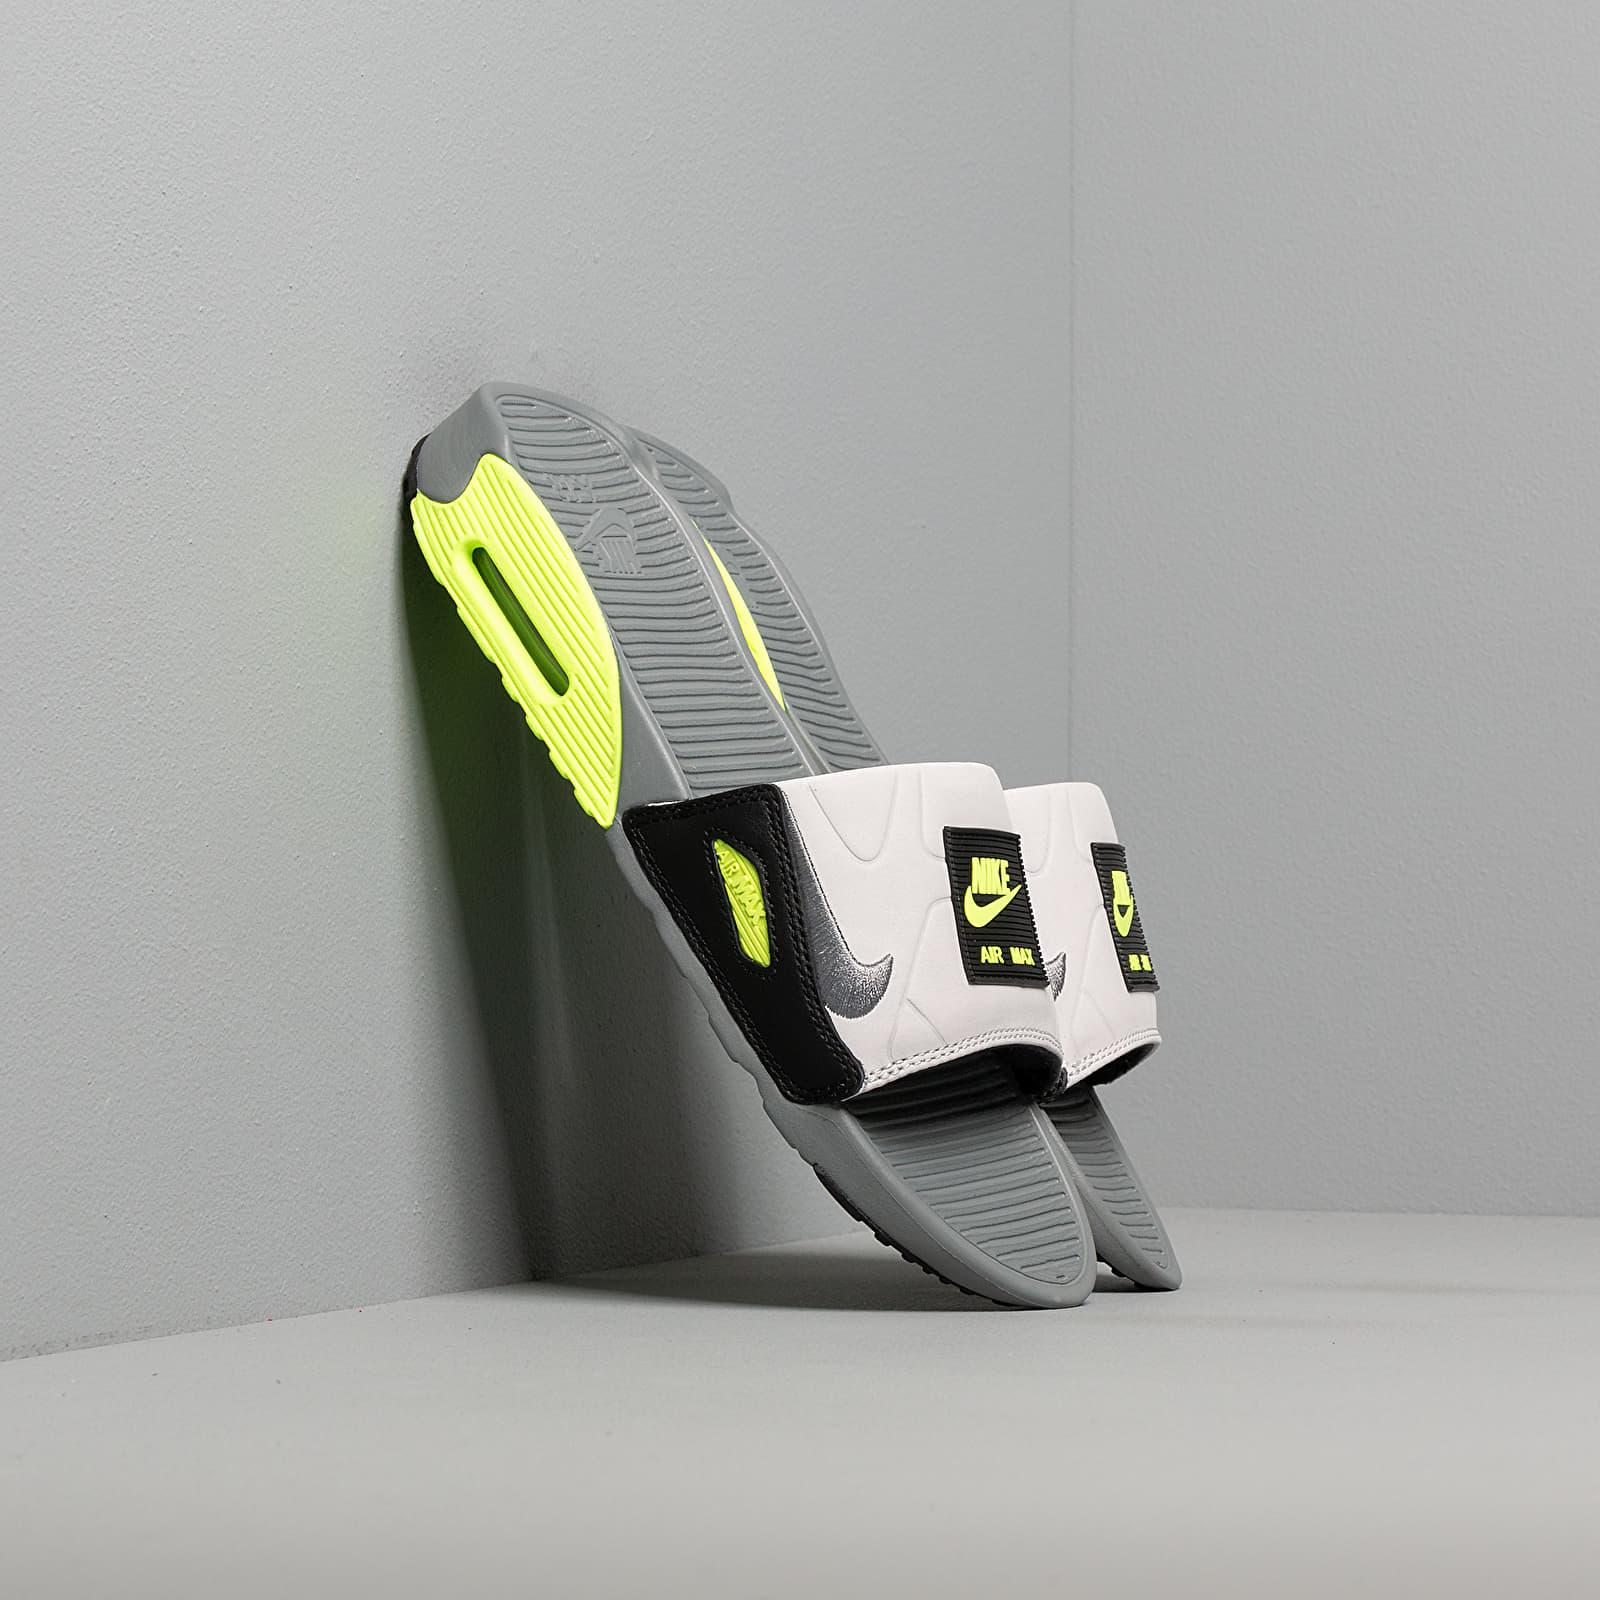 Dámské tenisky a boty Nike Wmns Air Max 90 Slide Smoke Grey/ Smoke Grey-Volt-Black